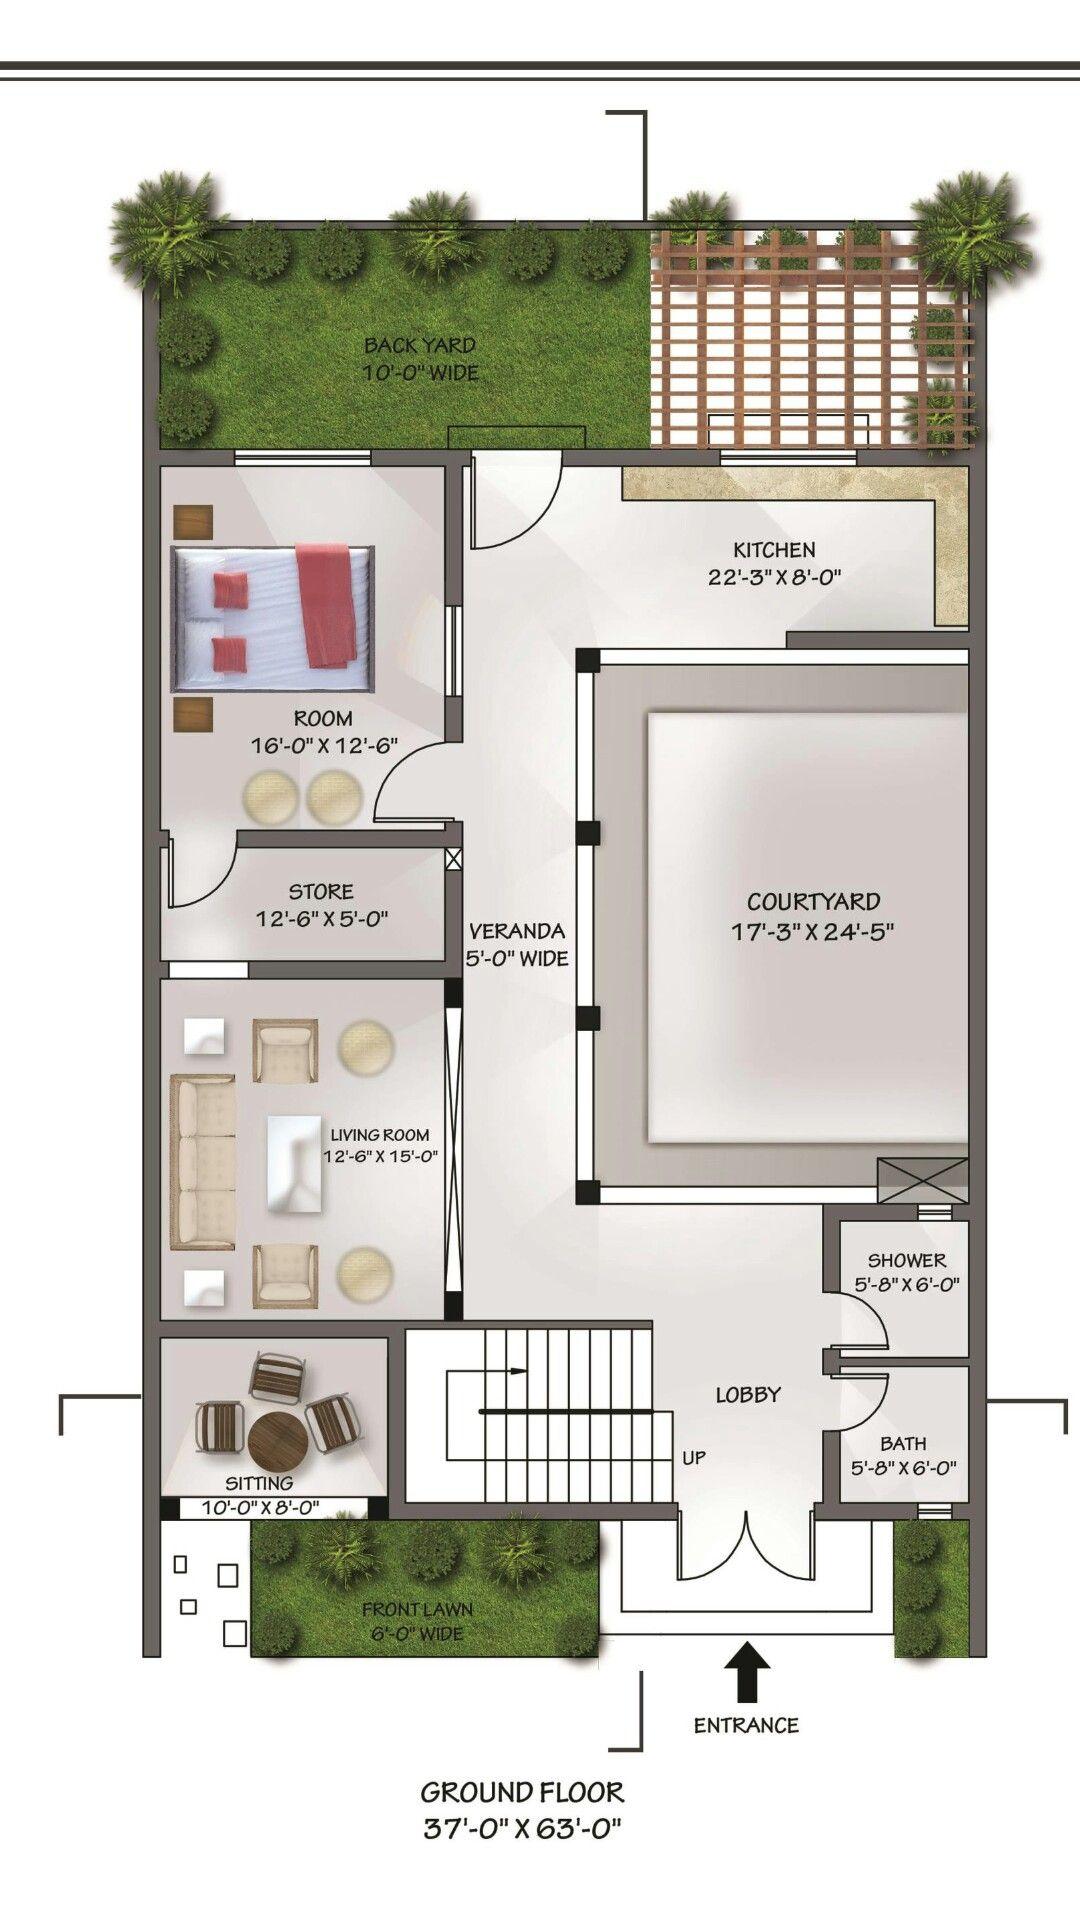 37 X 63 Ground Floor Plan Floor Plans House Plans